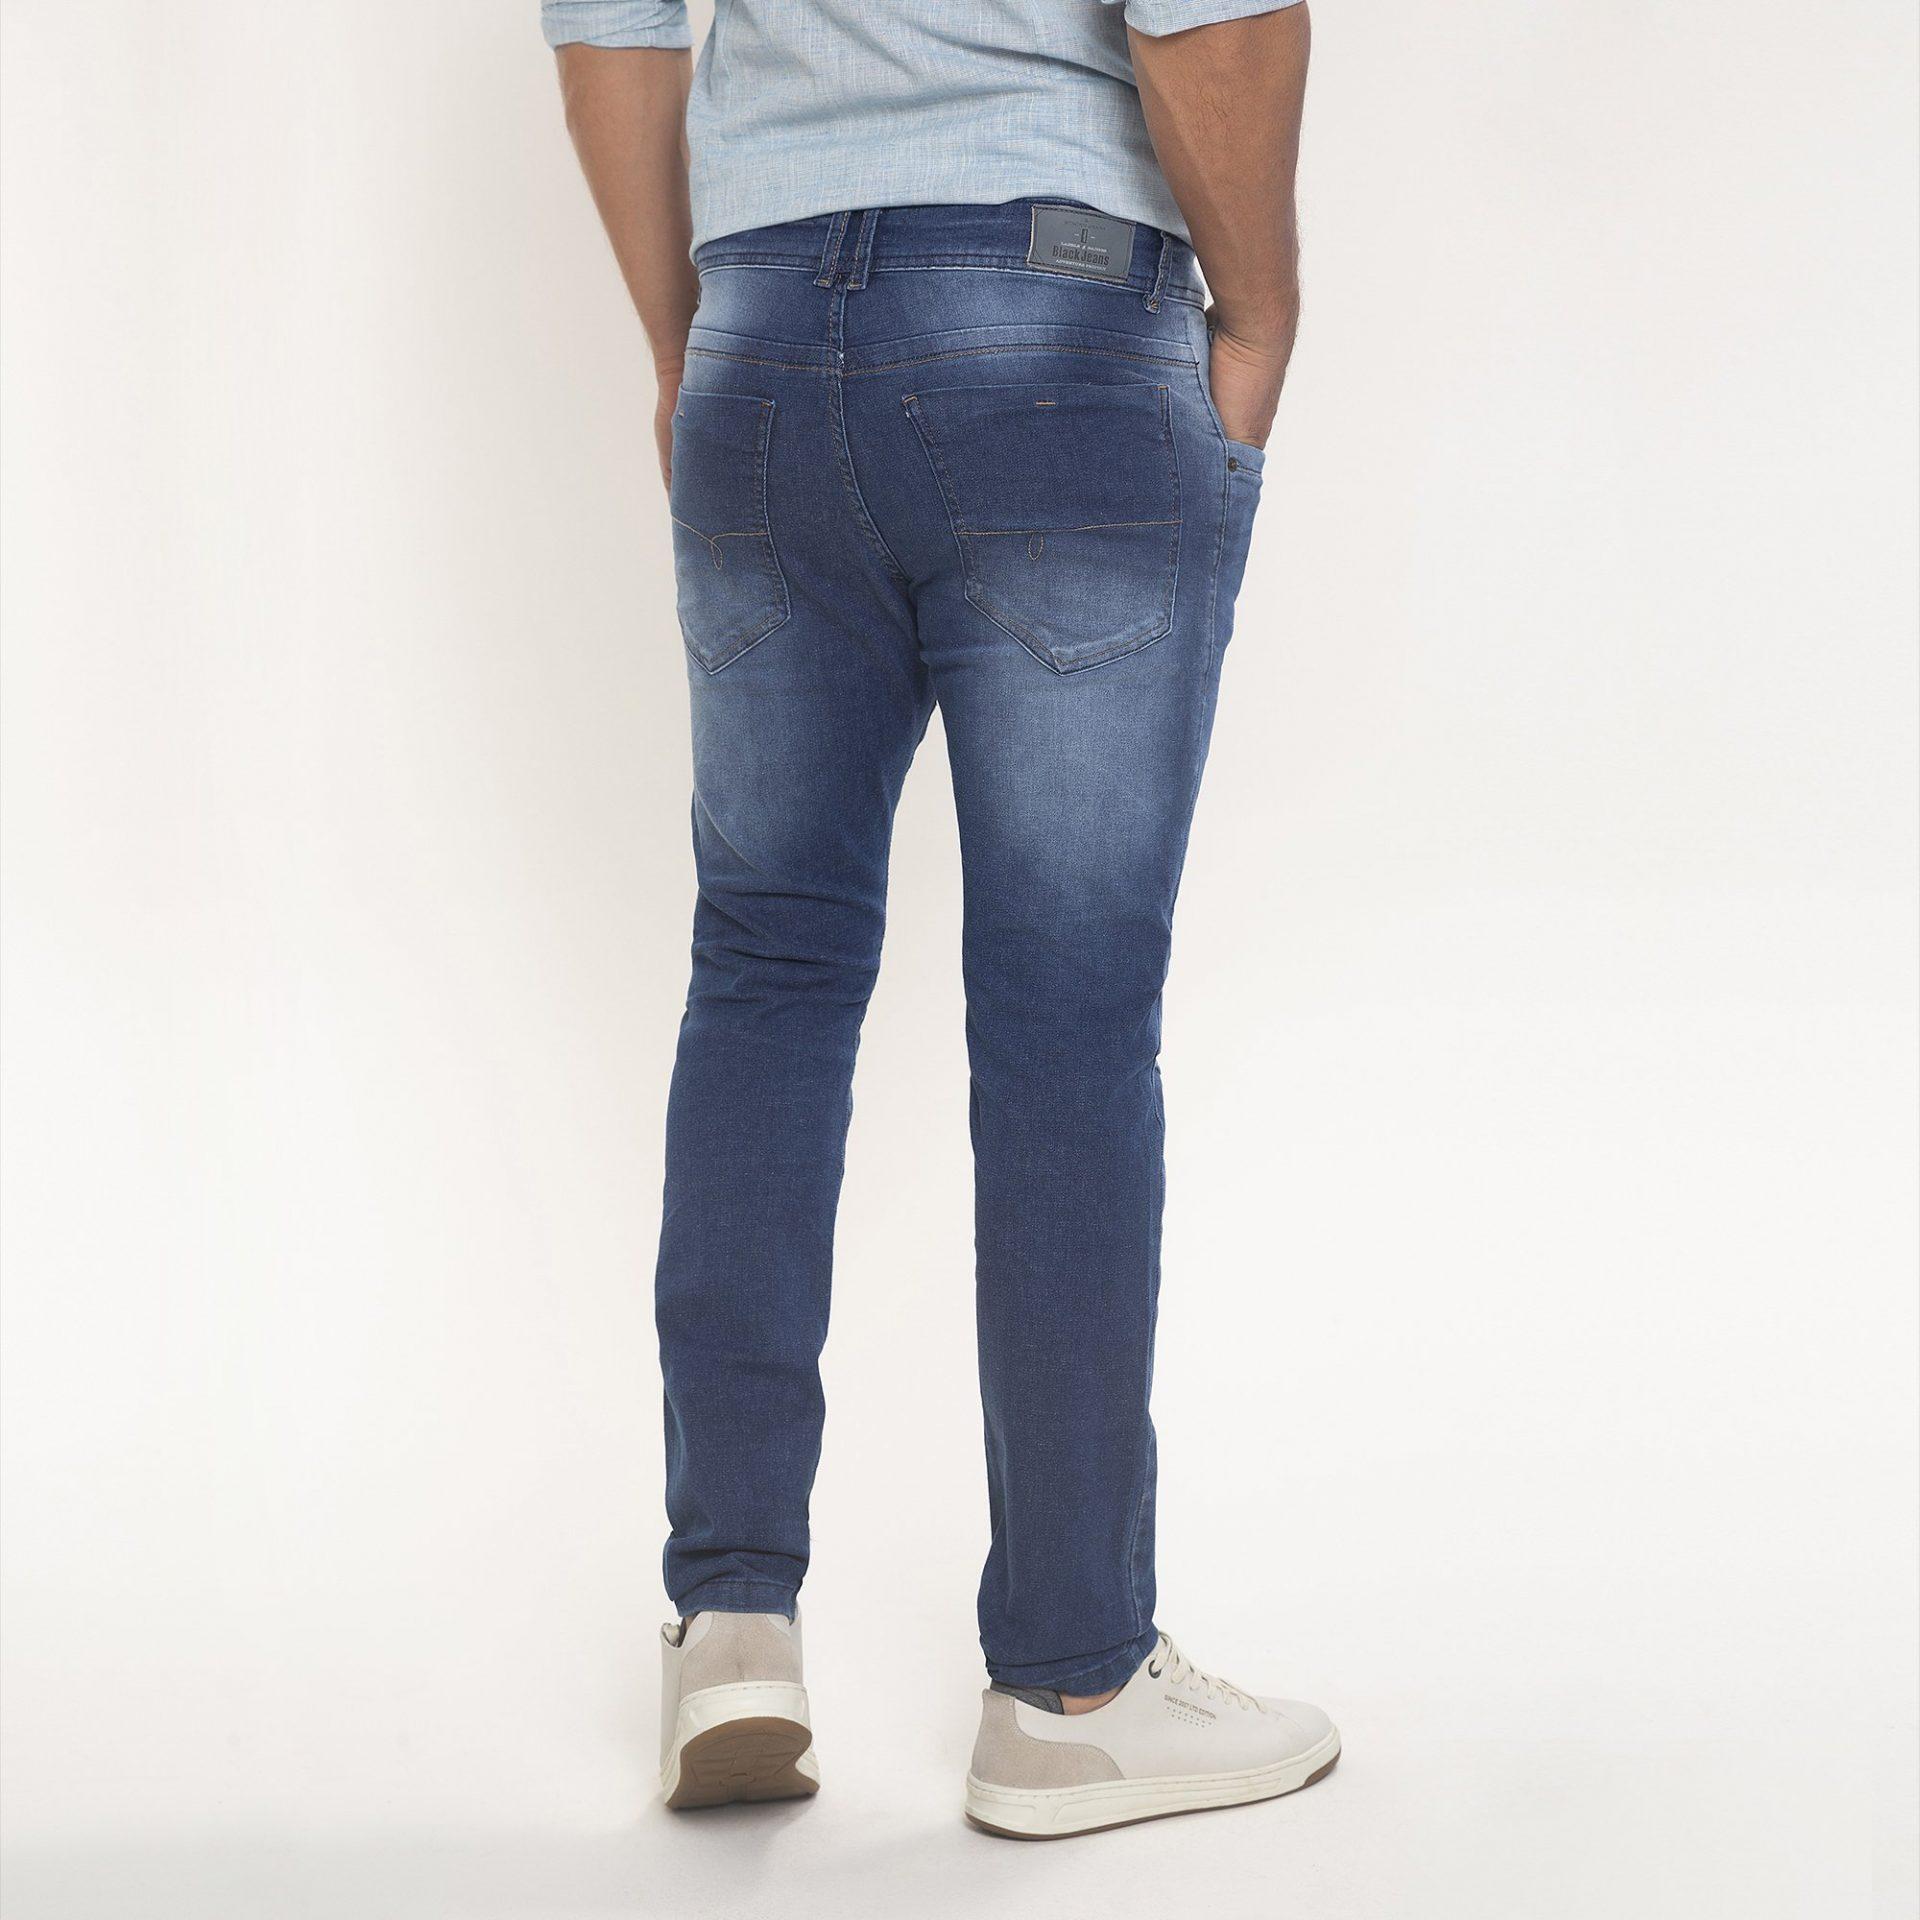 Calça Jeans Destroyed 2